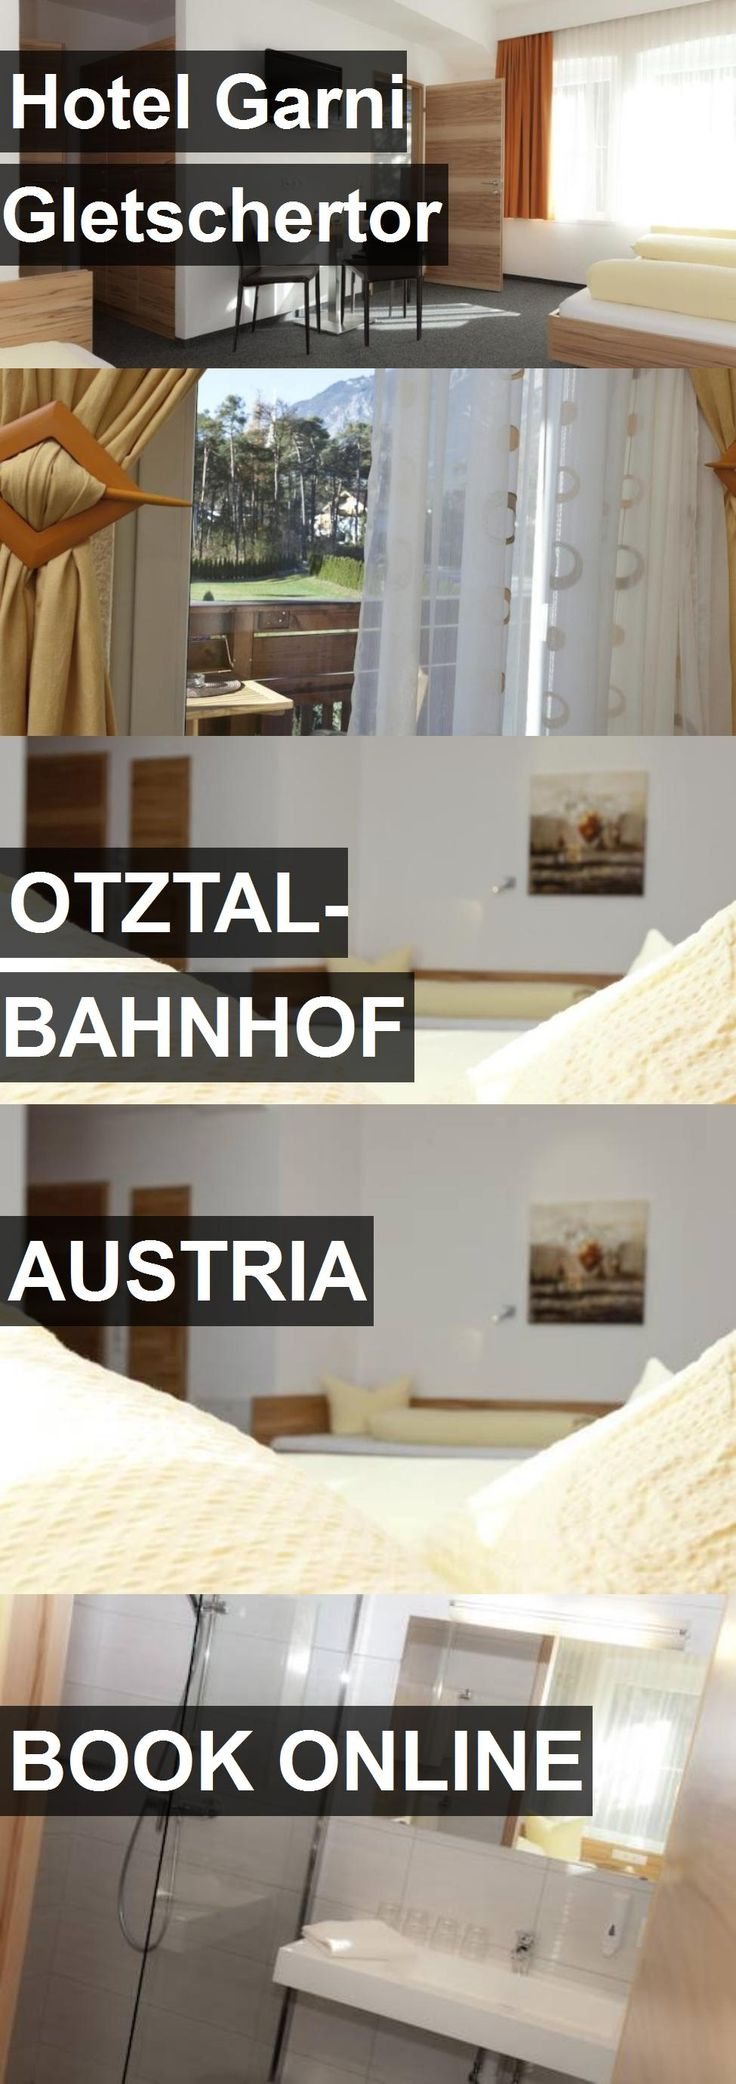 Hotel Garni Gletschertor in Otztal-Bahnhof, Austria. For more information, photos, reviews and best prices please follow the link. #Austria #Otztal-Bahnhof #travel #vacation #hotel